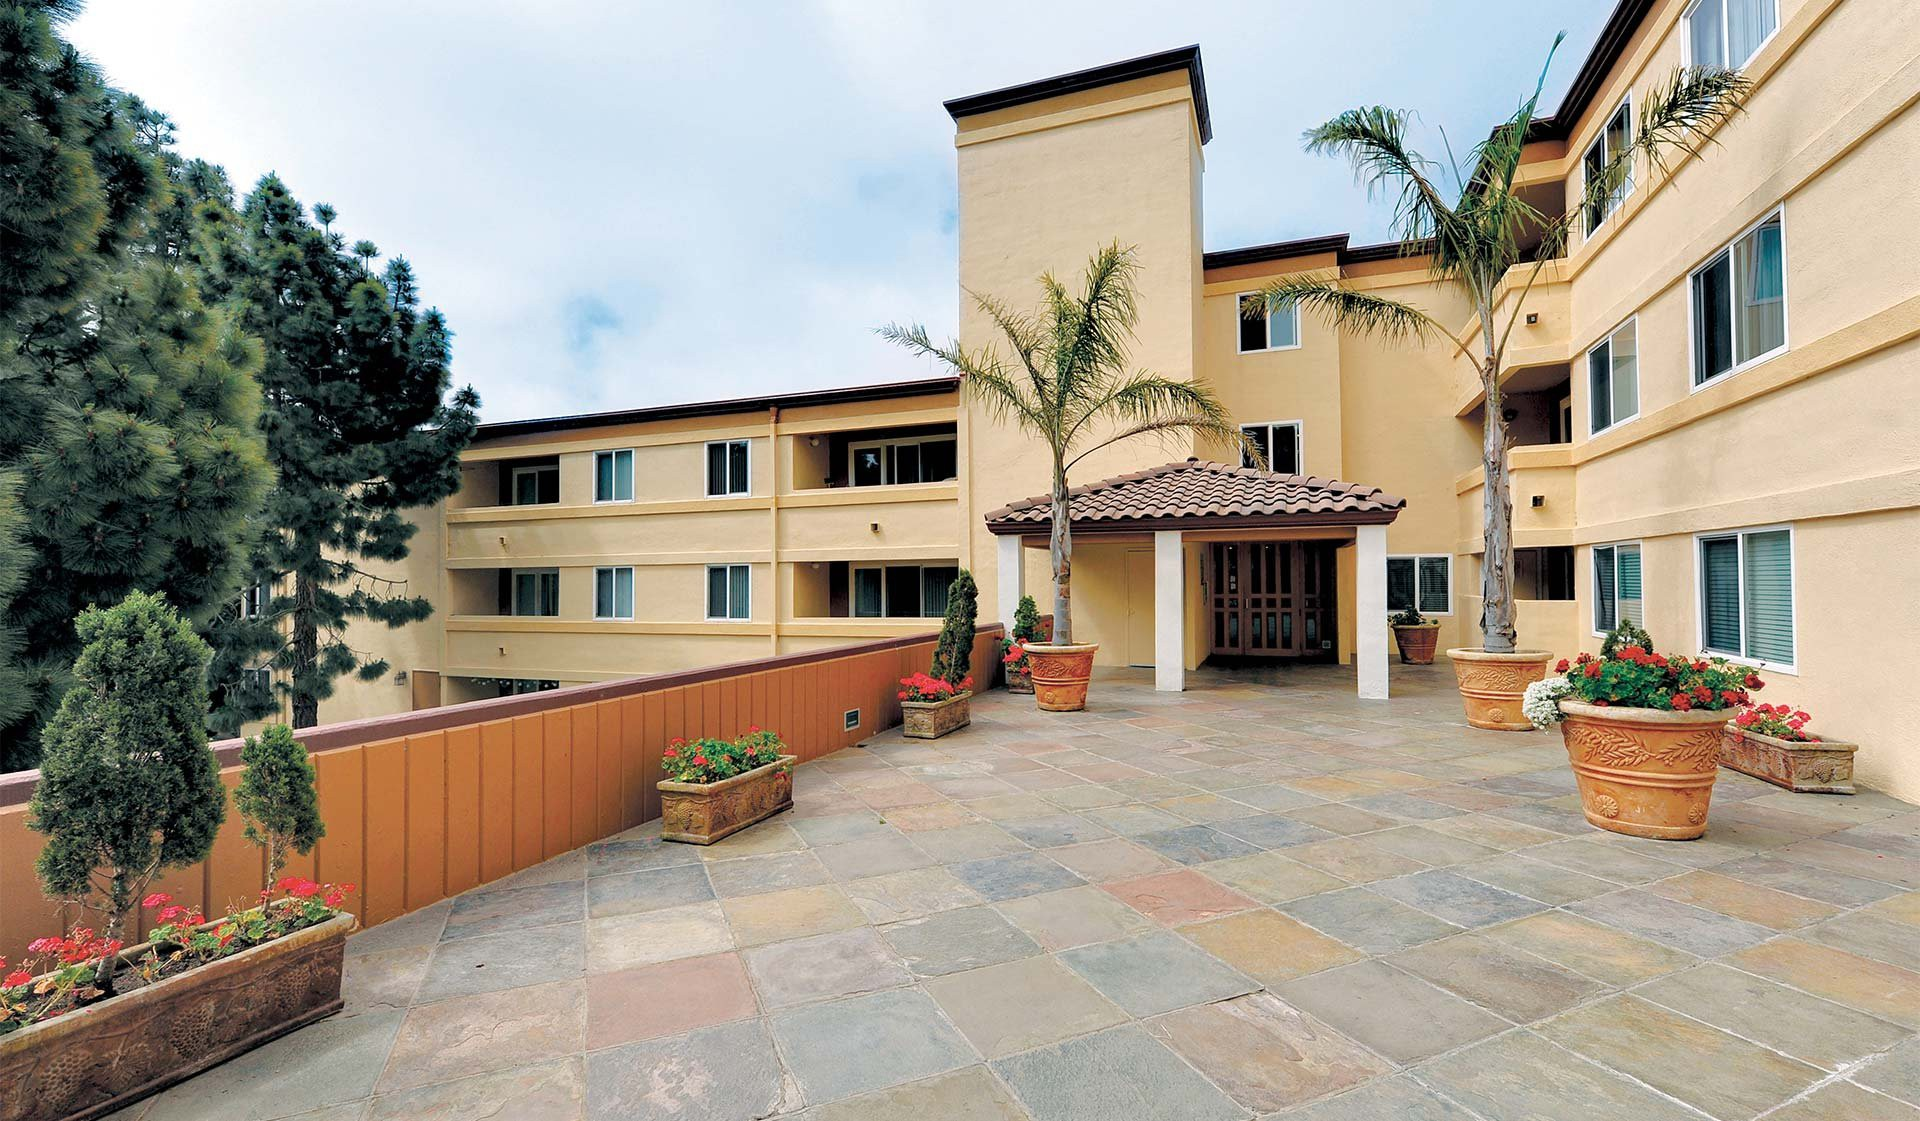 Horizons West Apartments